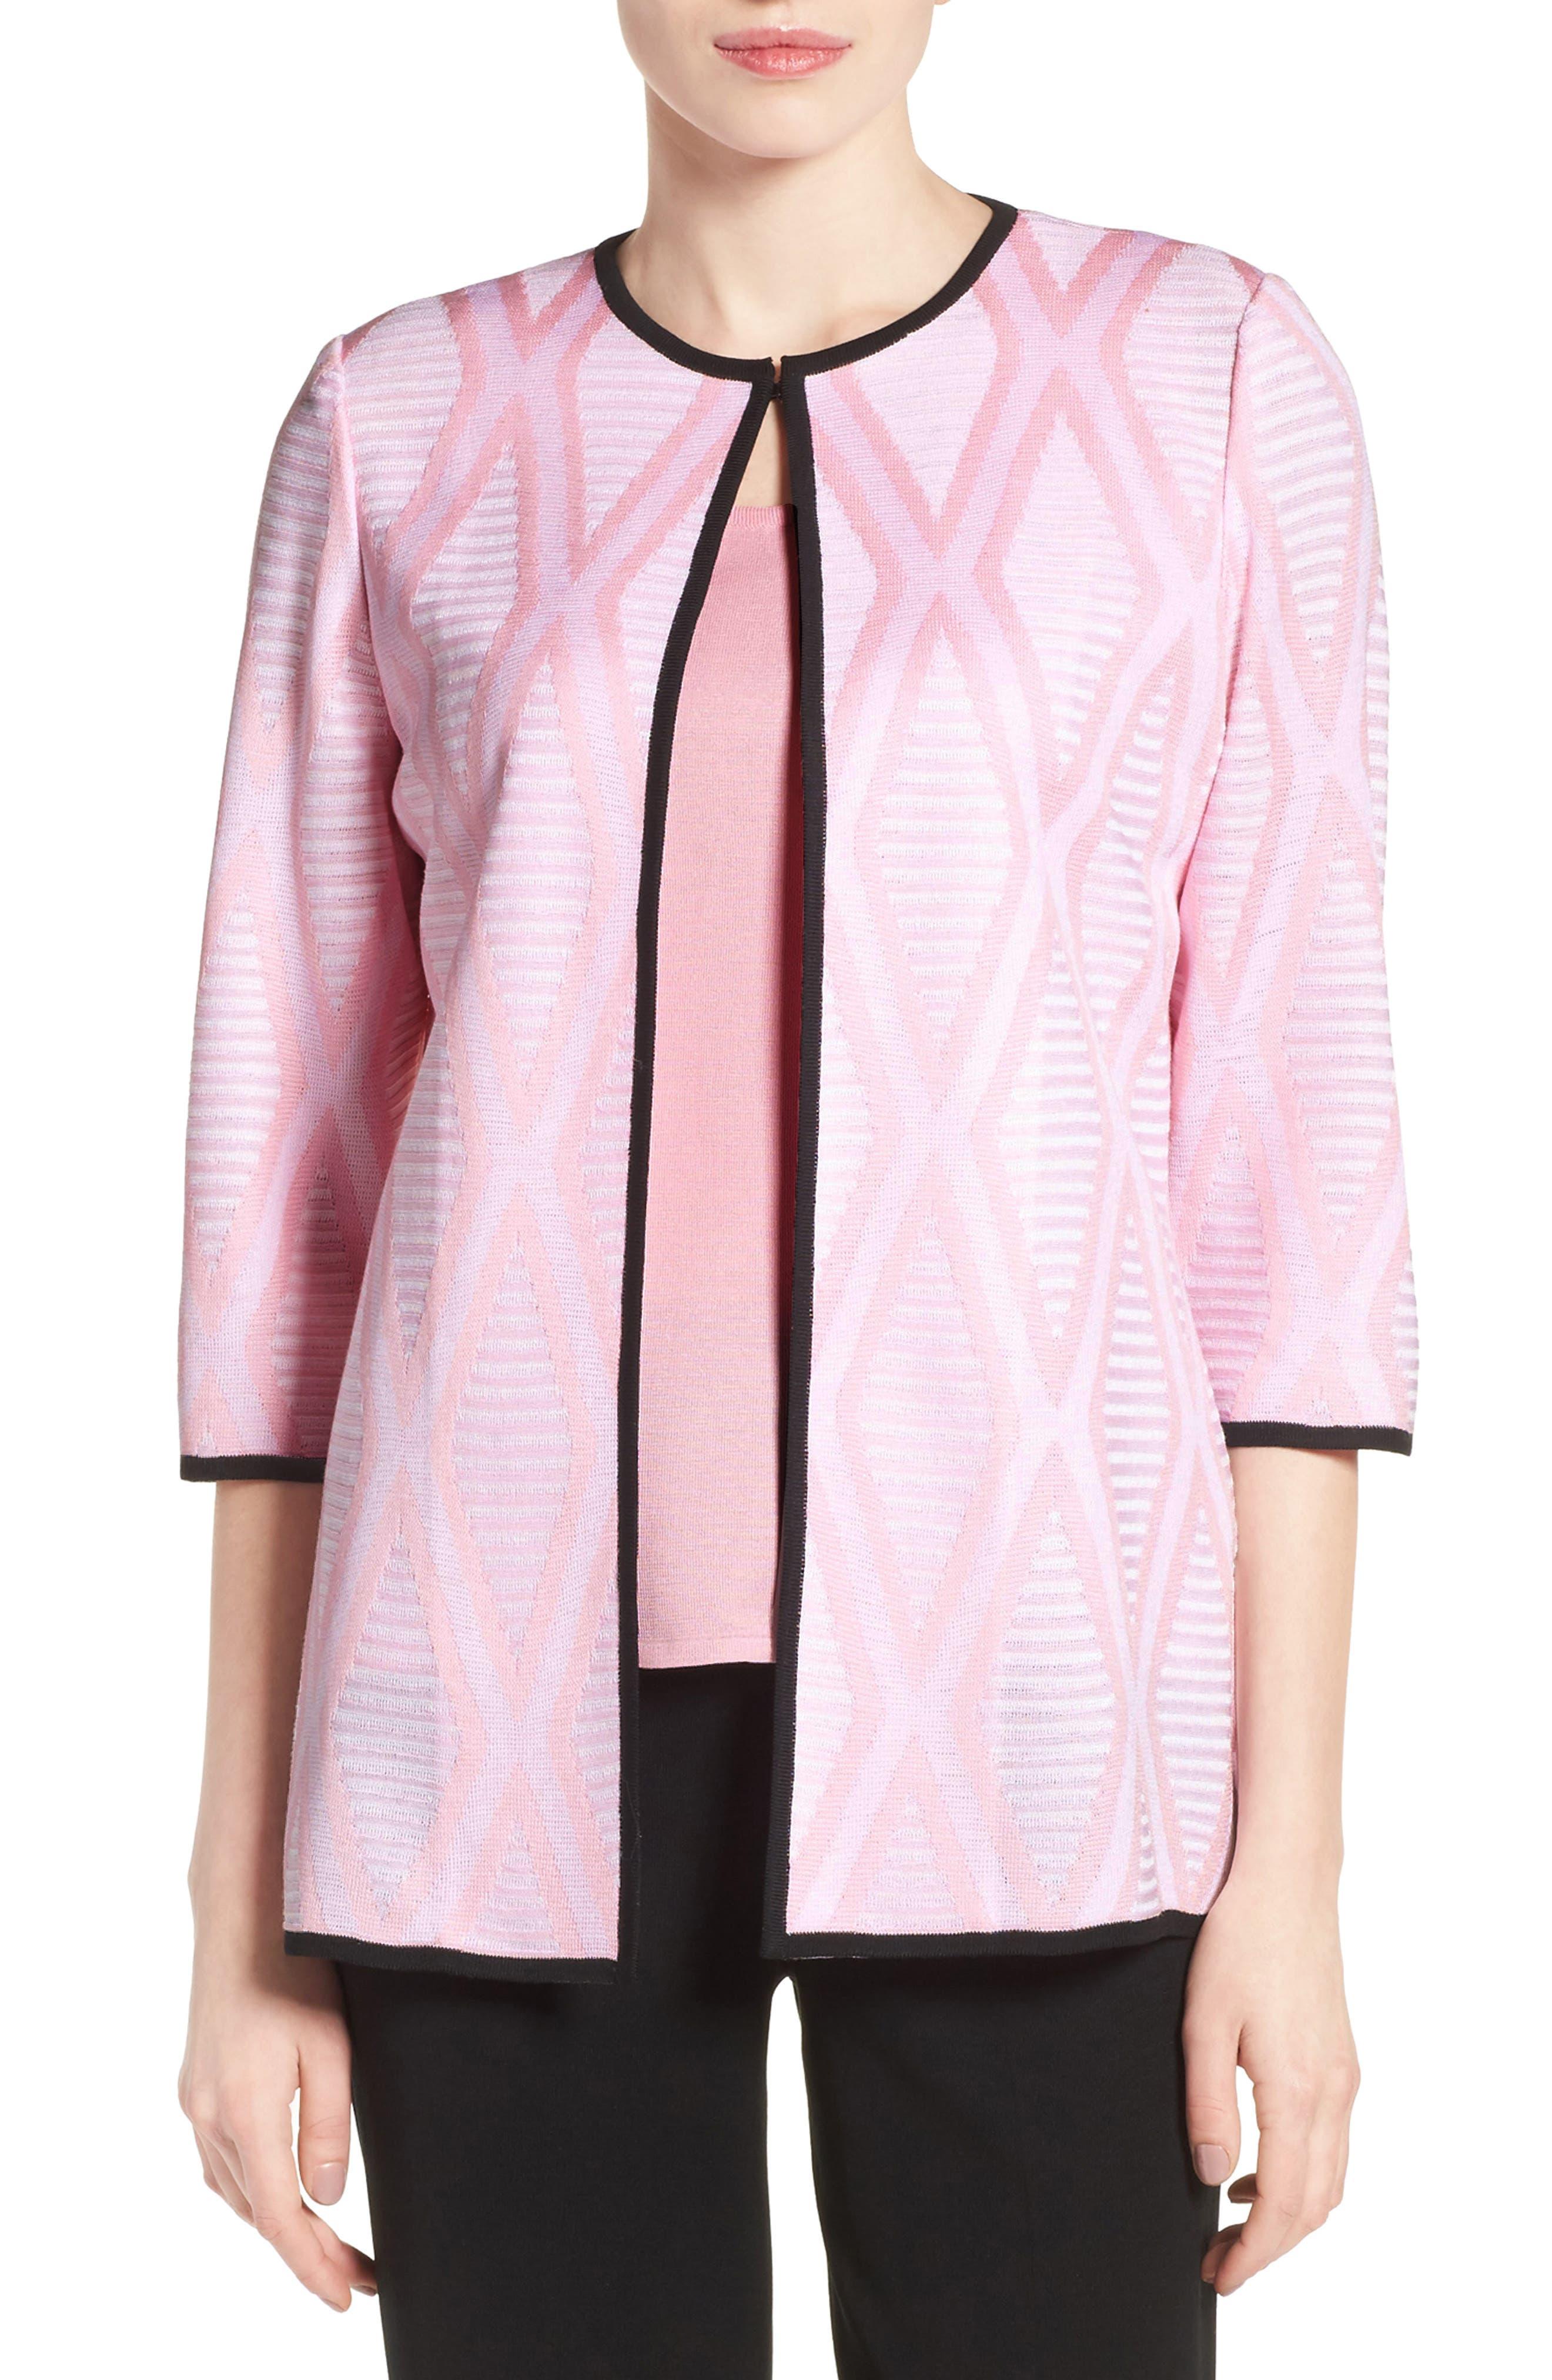 Ming Wang Contrast Trim Diamond Pattern Collarless Jacket